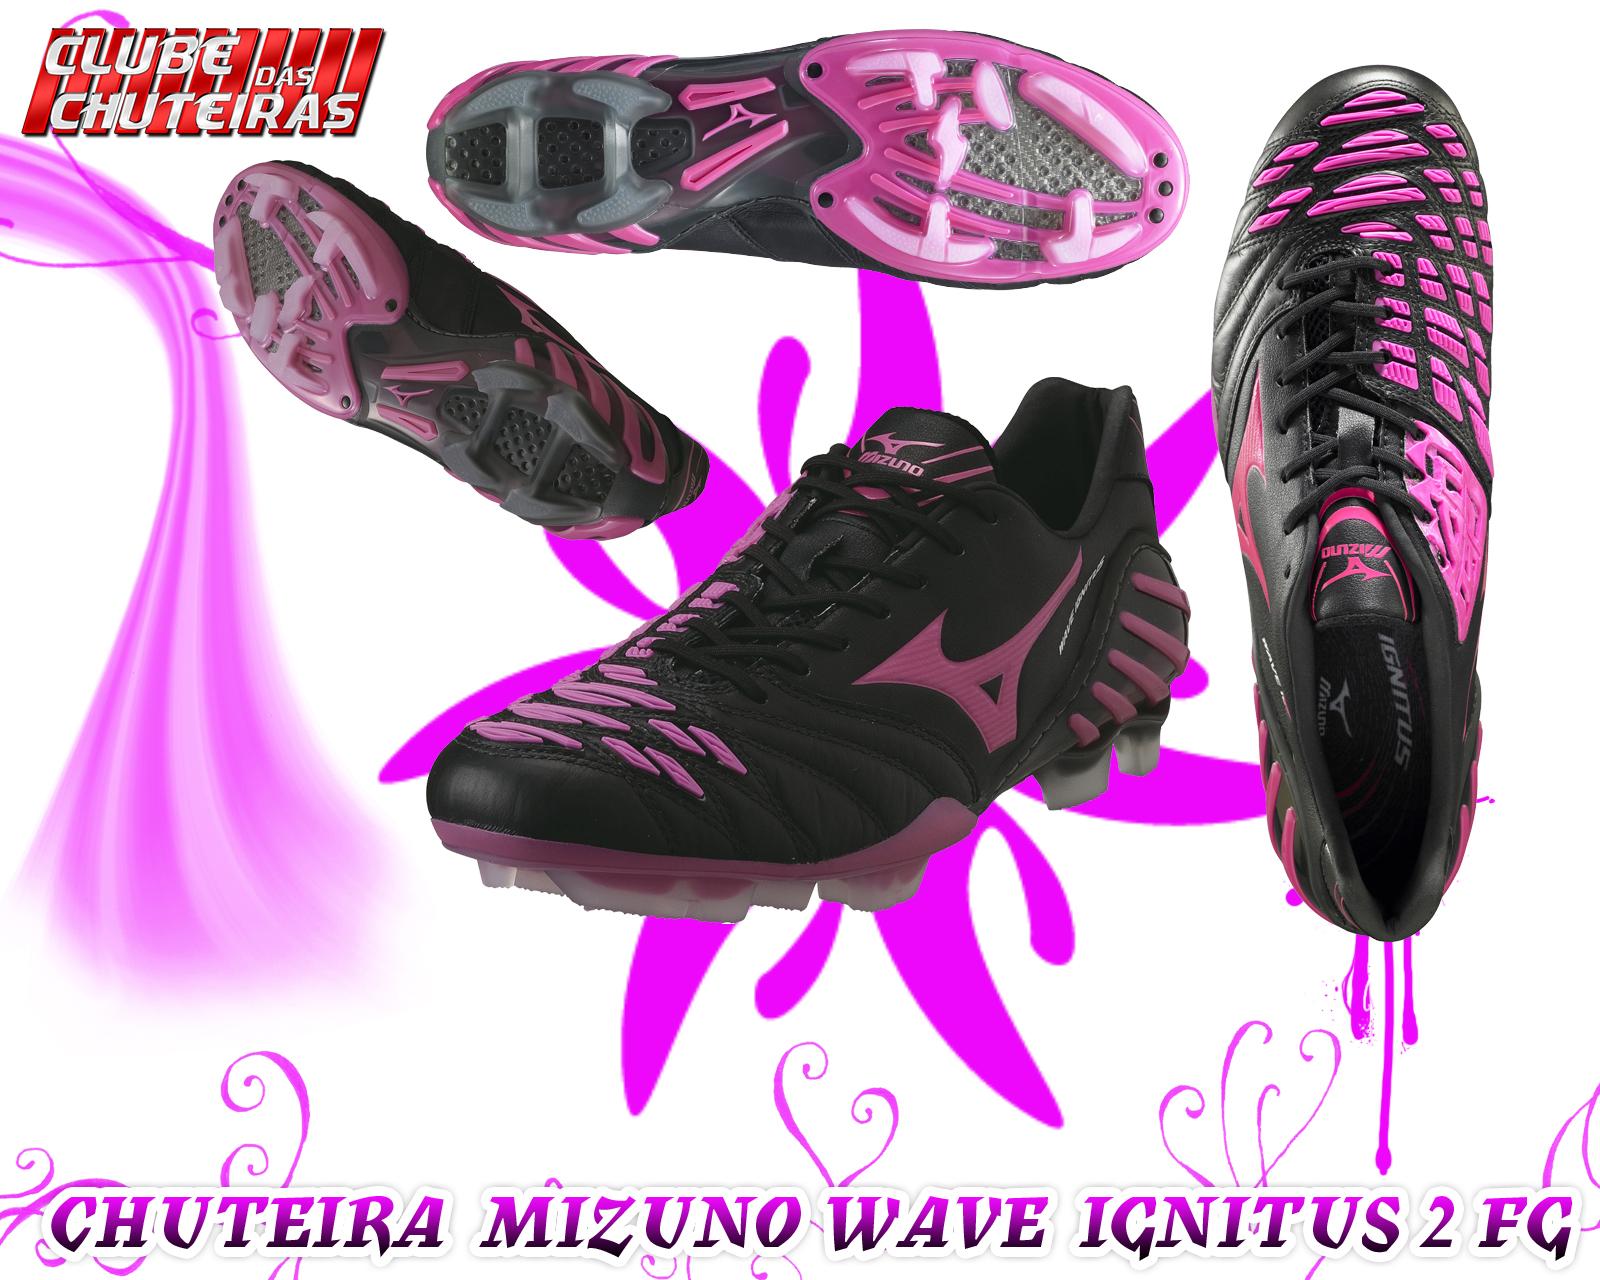 Chuteira Mizuno Wave Ignitus 2 FG Preto e Magenta - Clube Das Chuteiras b162a05db21aa